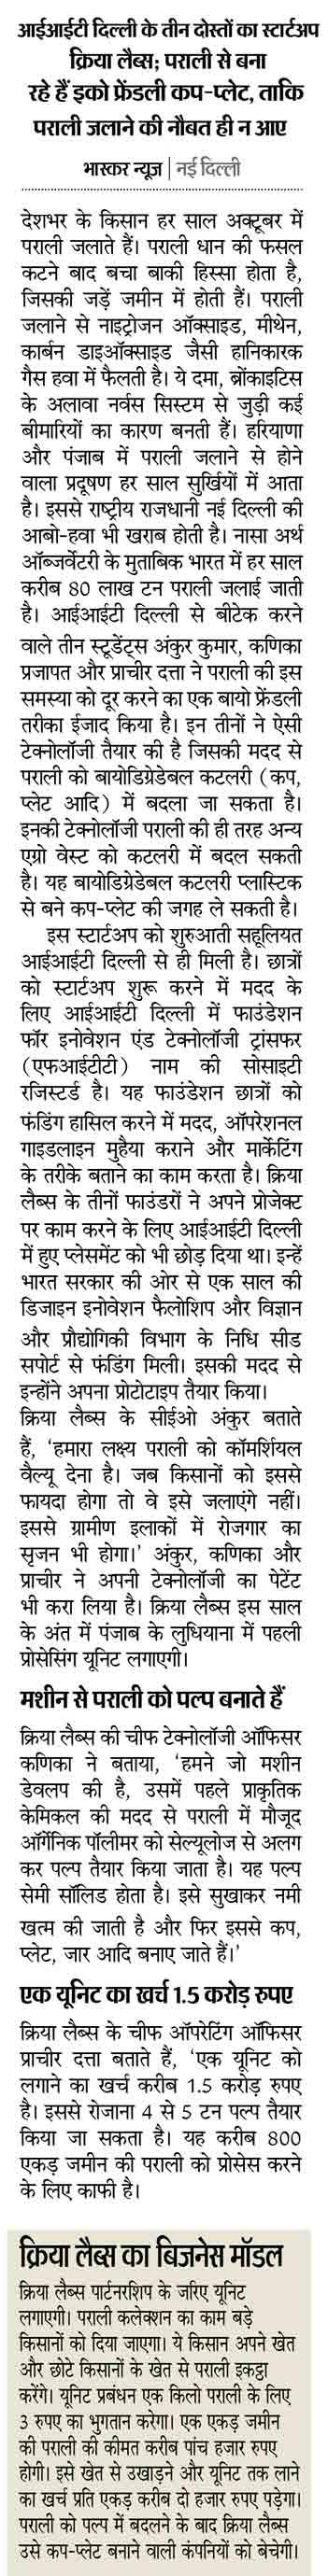 IIT Delhi startup devises technology to convert agro waste into pulp